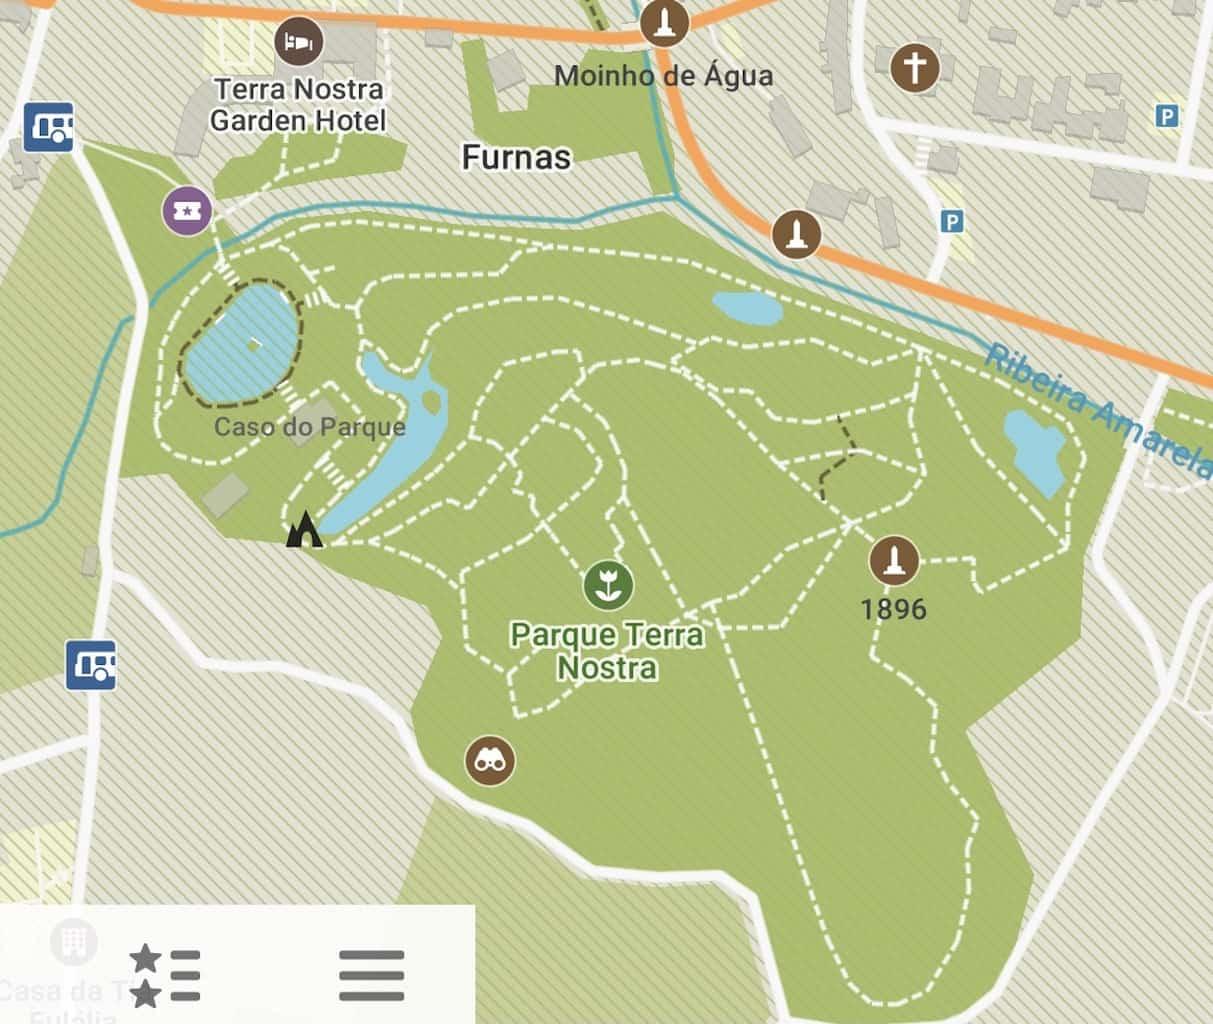 Parque Terra Nostra Map